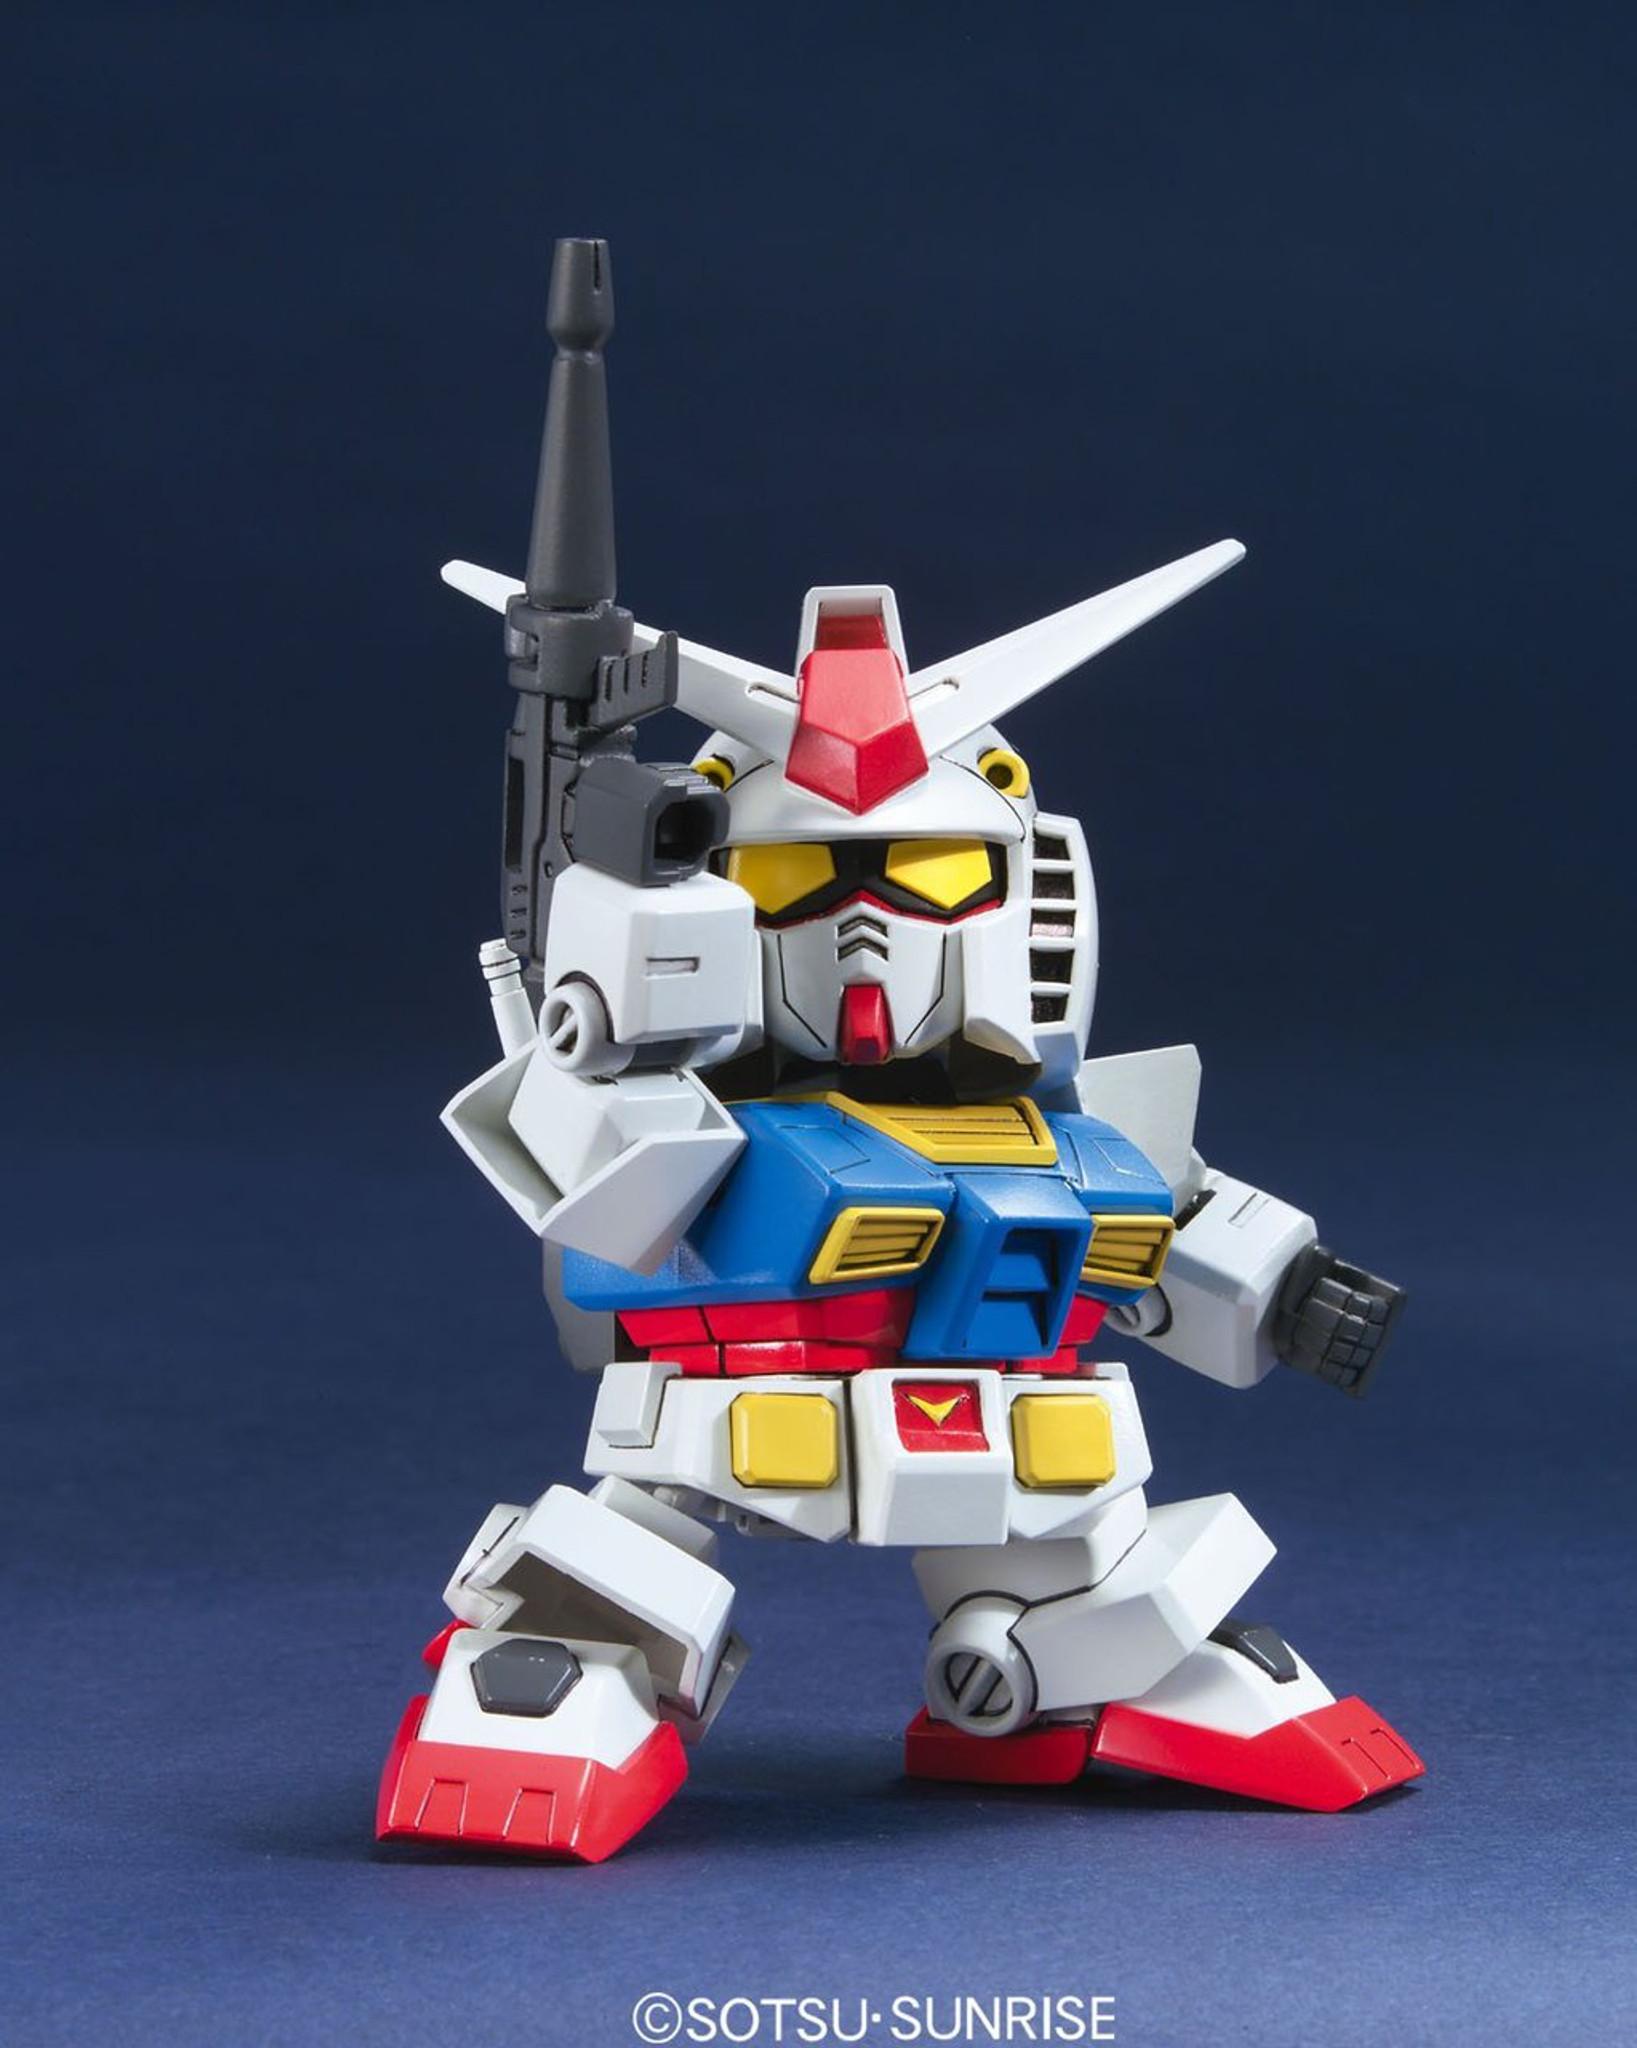 Bandai Sd Bb 329 Gundam Rx 78 2 Plazajapan Original Model Kits V Animation Color Plastic